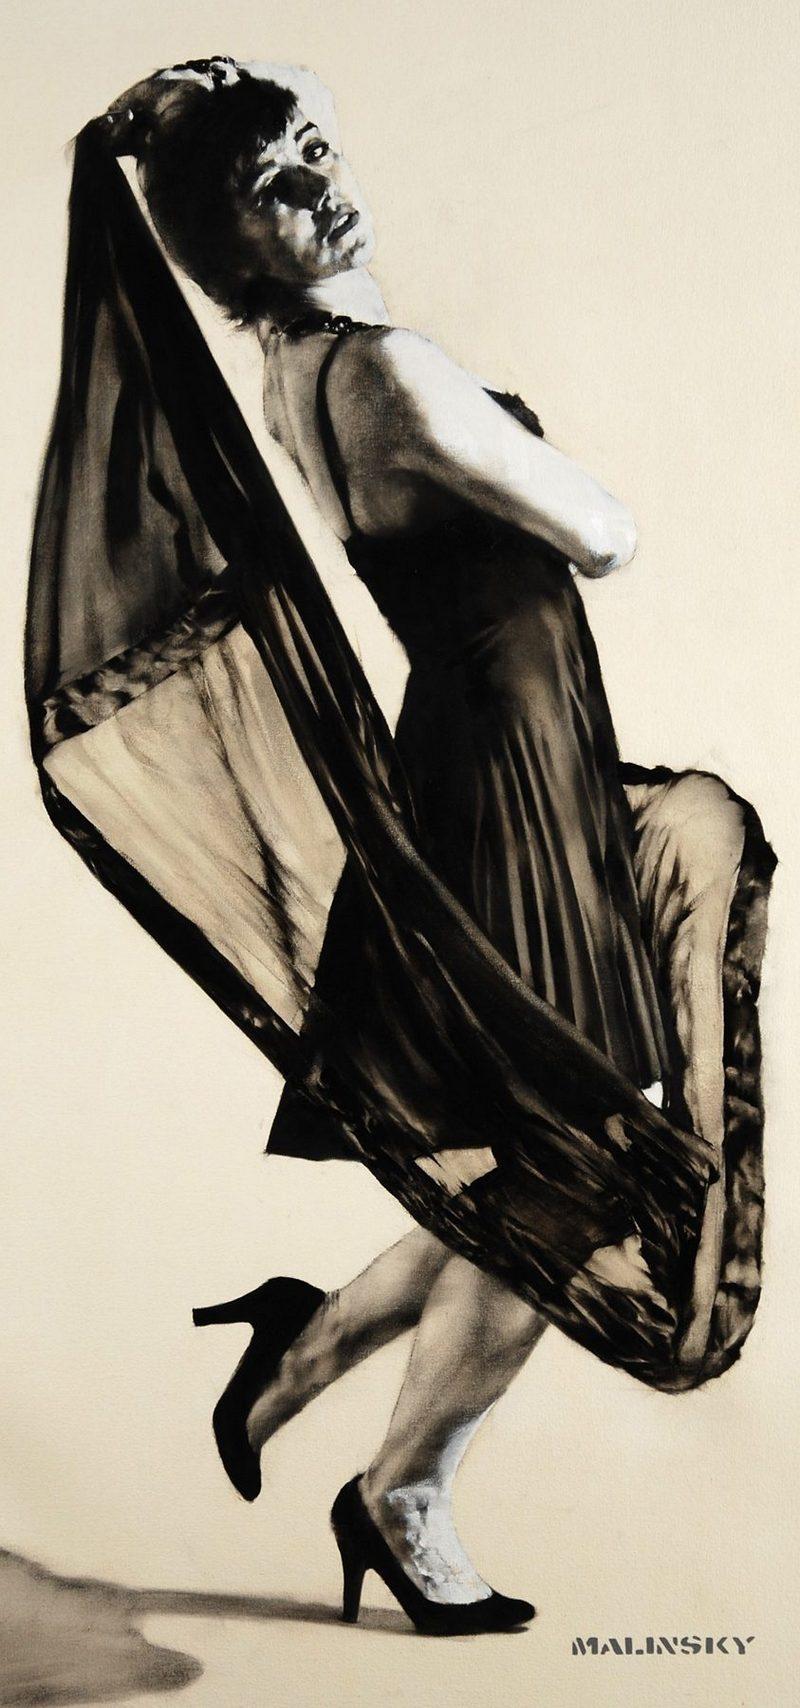 Charles Malinsky - Jesse, Cocktail Dress & Wrap